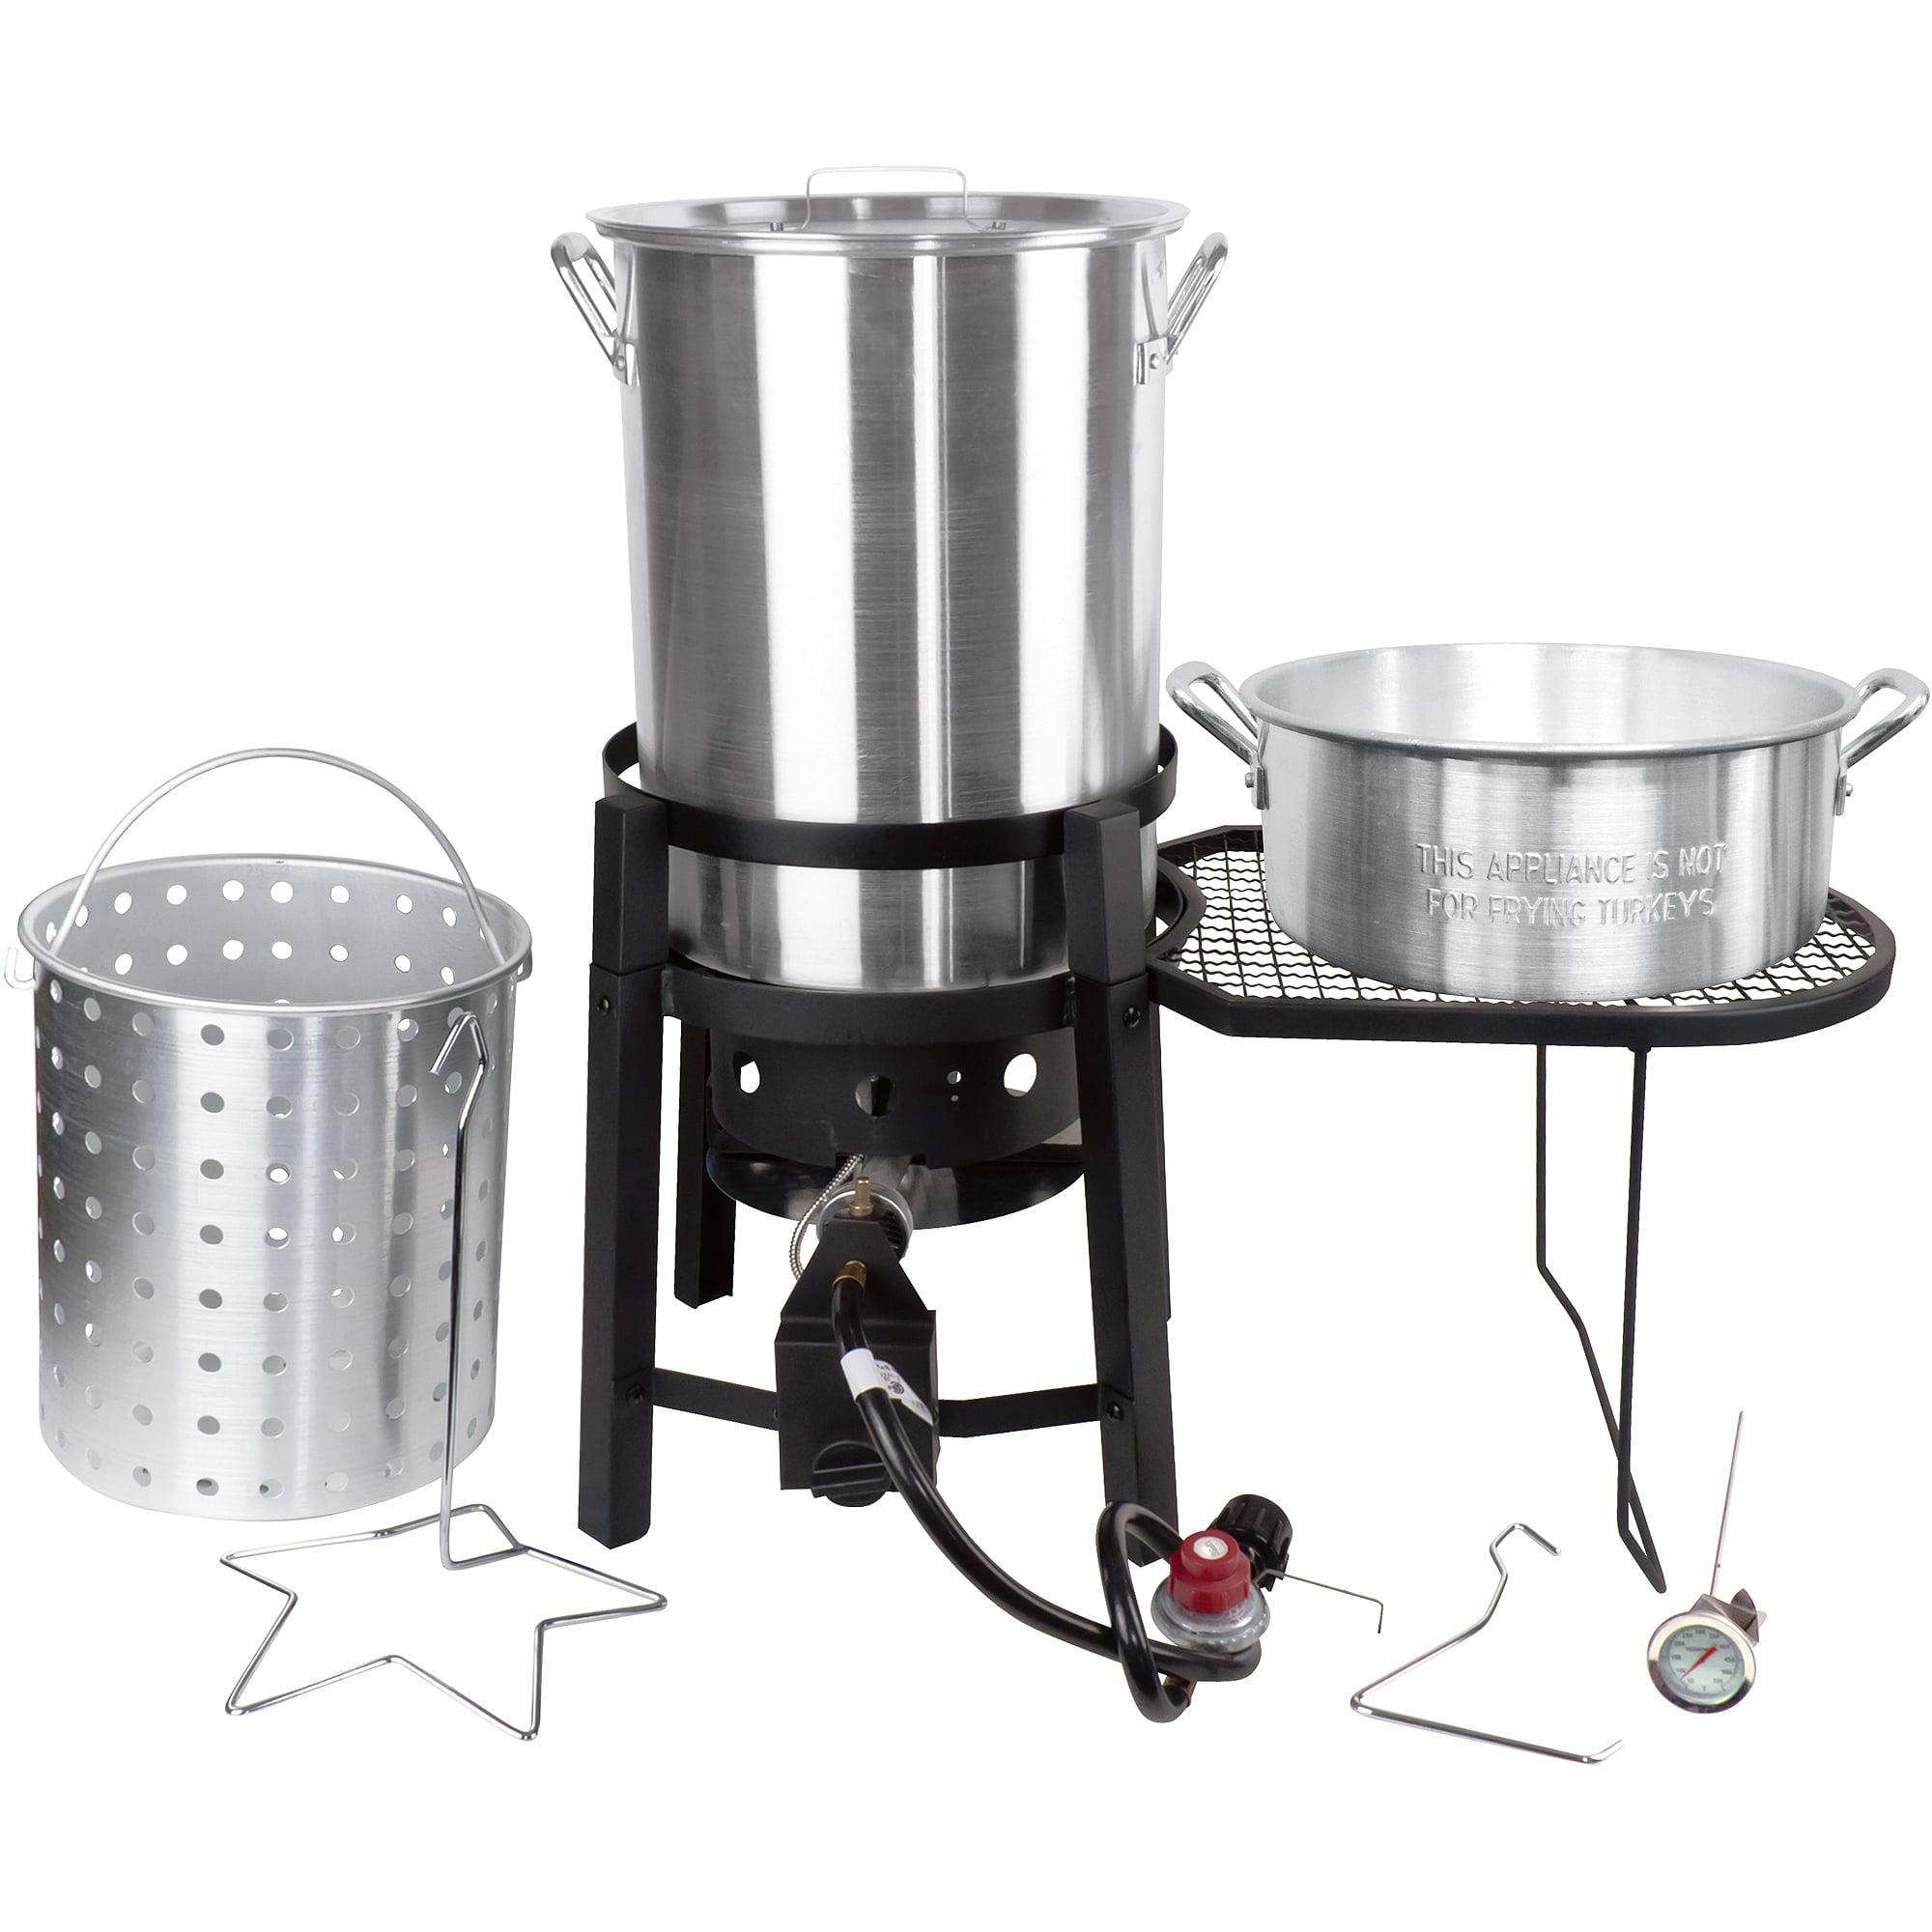 Cajun Injector 30-Quart Turkey Fryer with Table